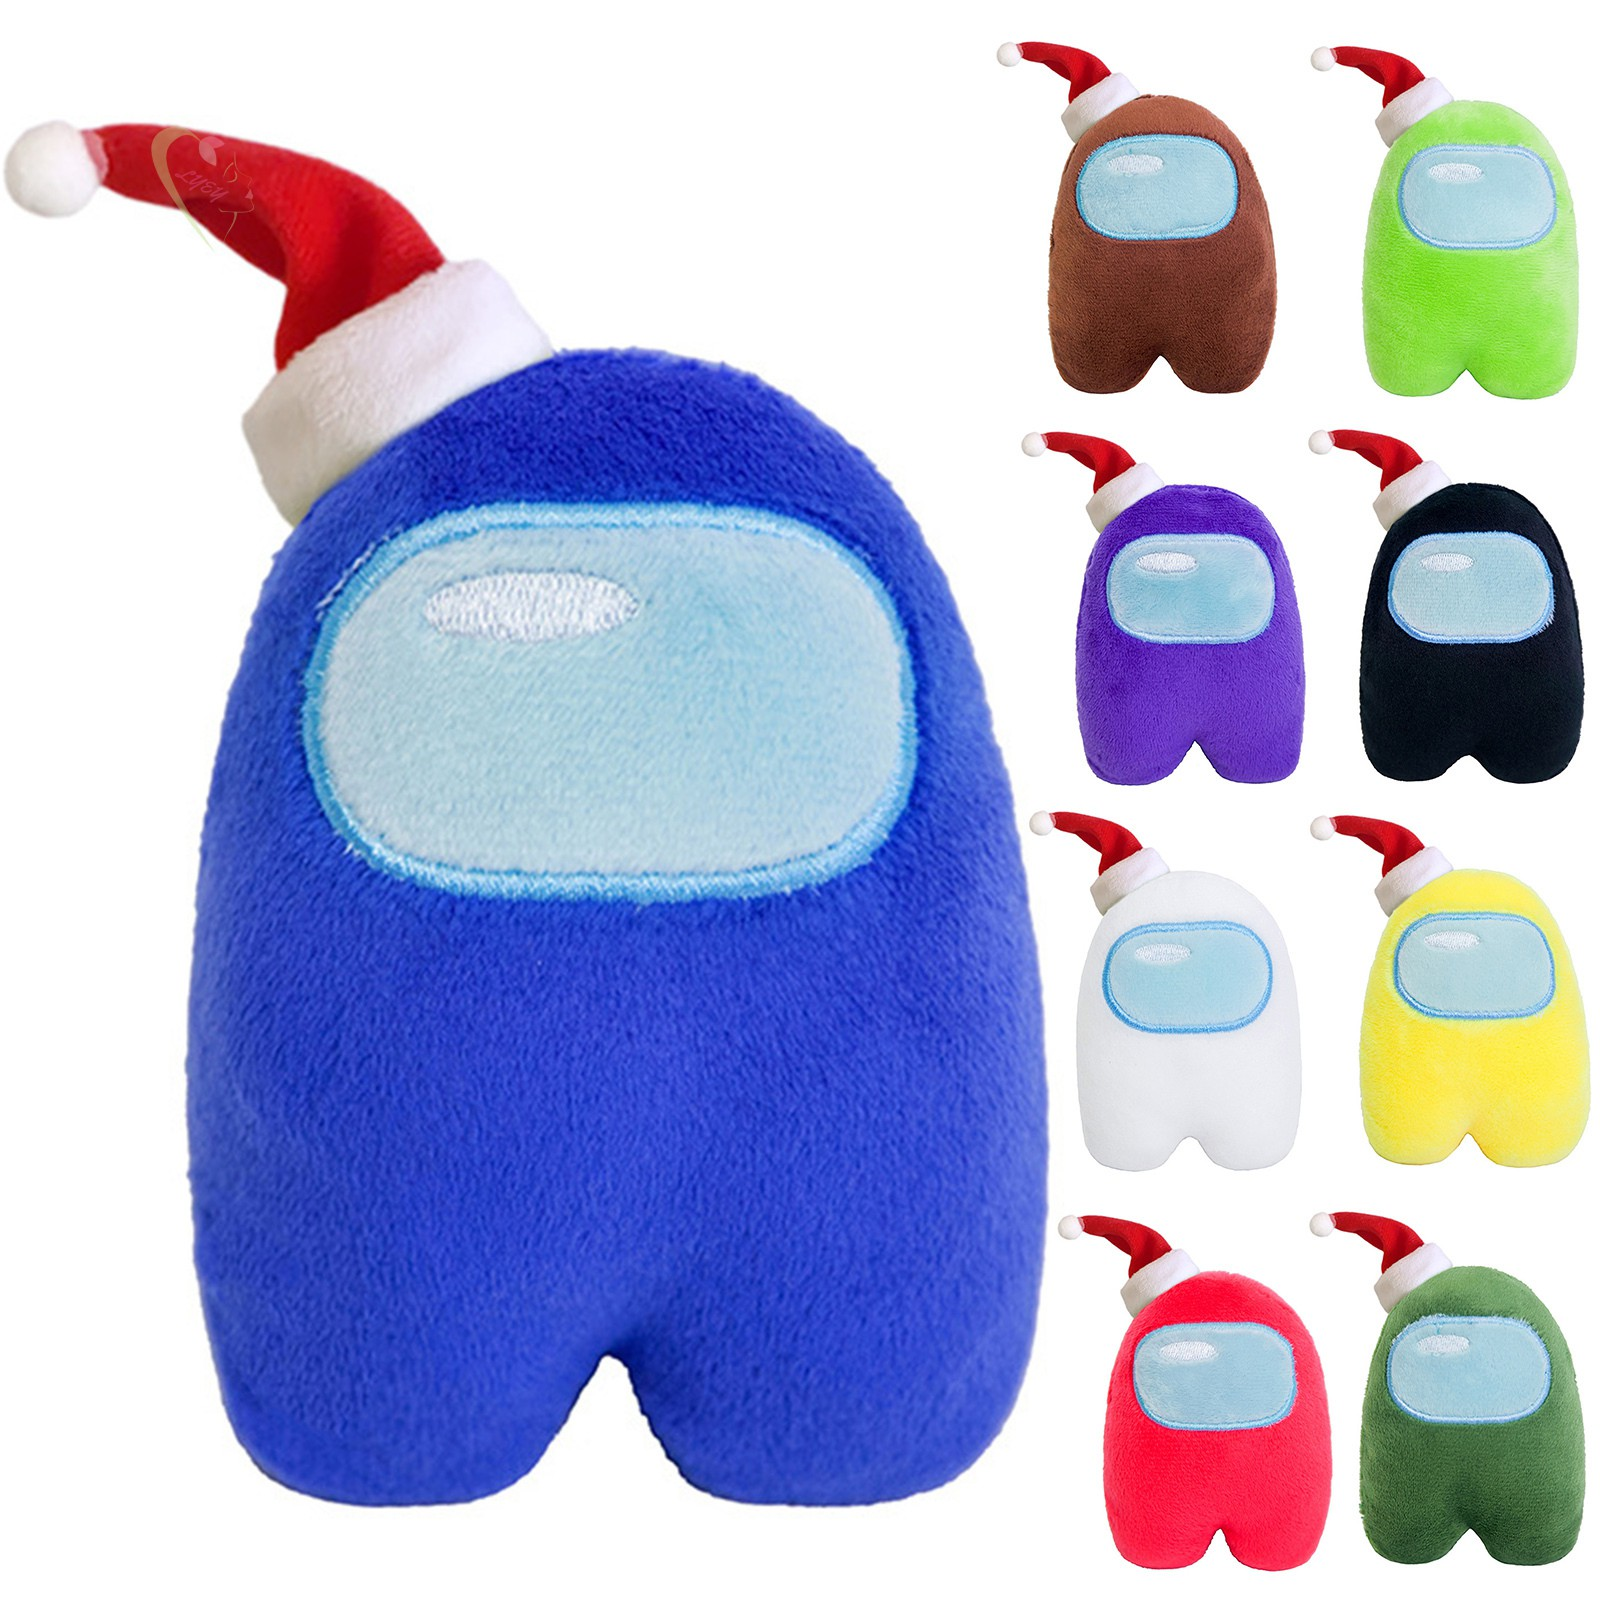 LE Xmas Hat Figure Among Us Plush Crewmate Plushie Kawaii Stuffed Soft Game Plush Toy Lovely Stuffed Doll Christmas Gift @VN